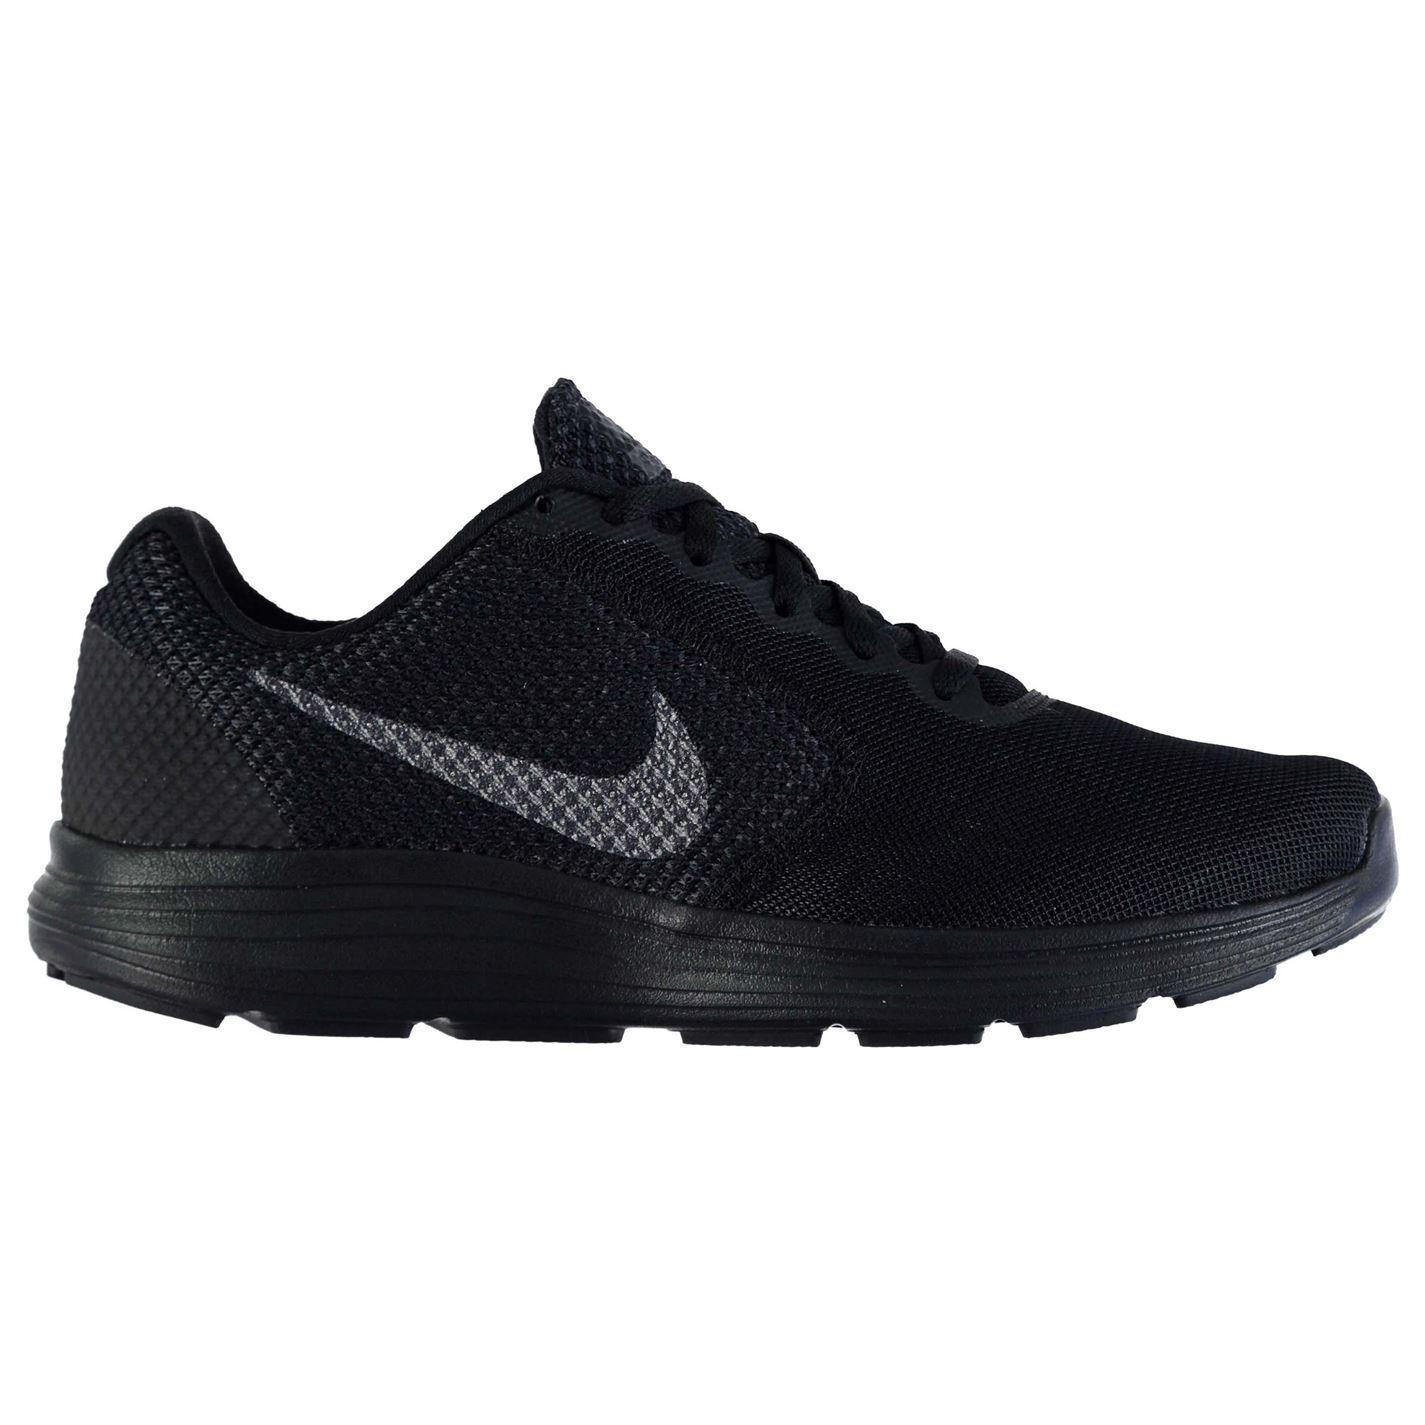 Nike Revolution 3 Trainers homme noir/ Gris  Sports chaussures Sneakers Footwear